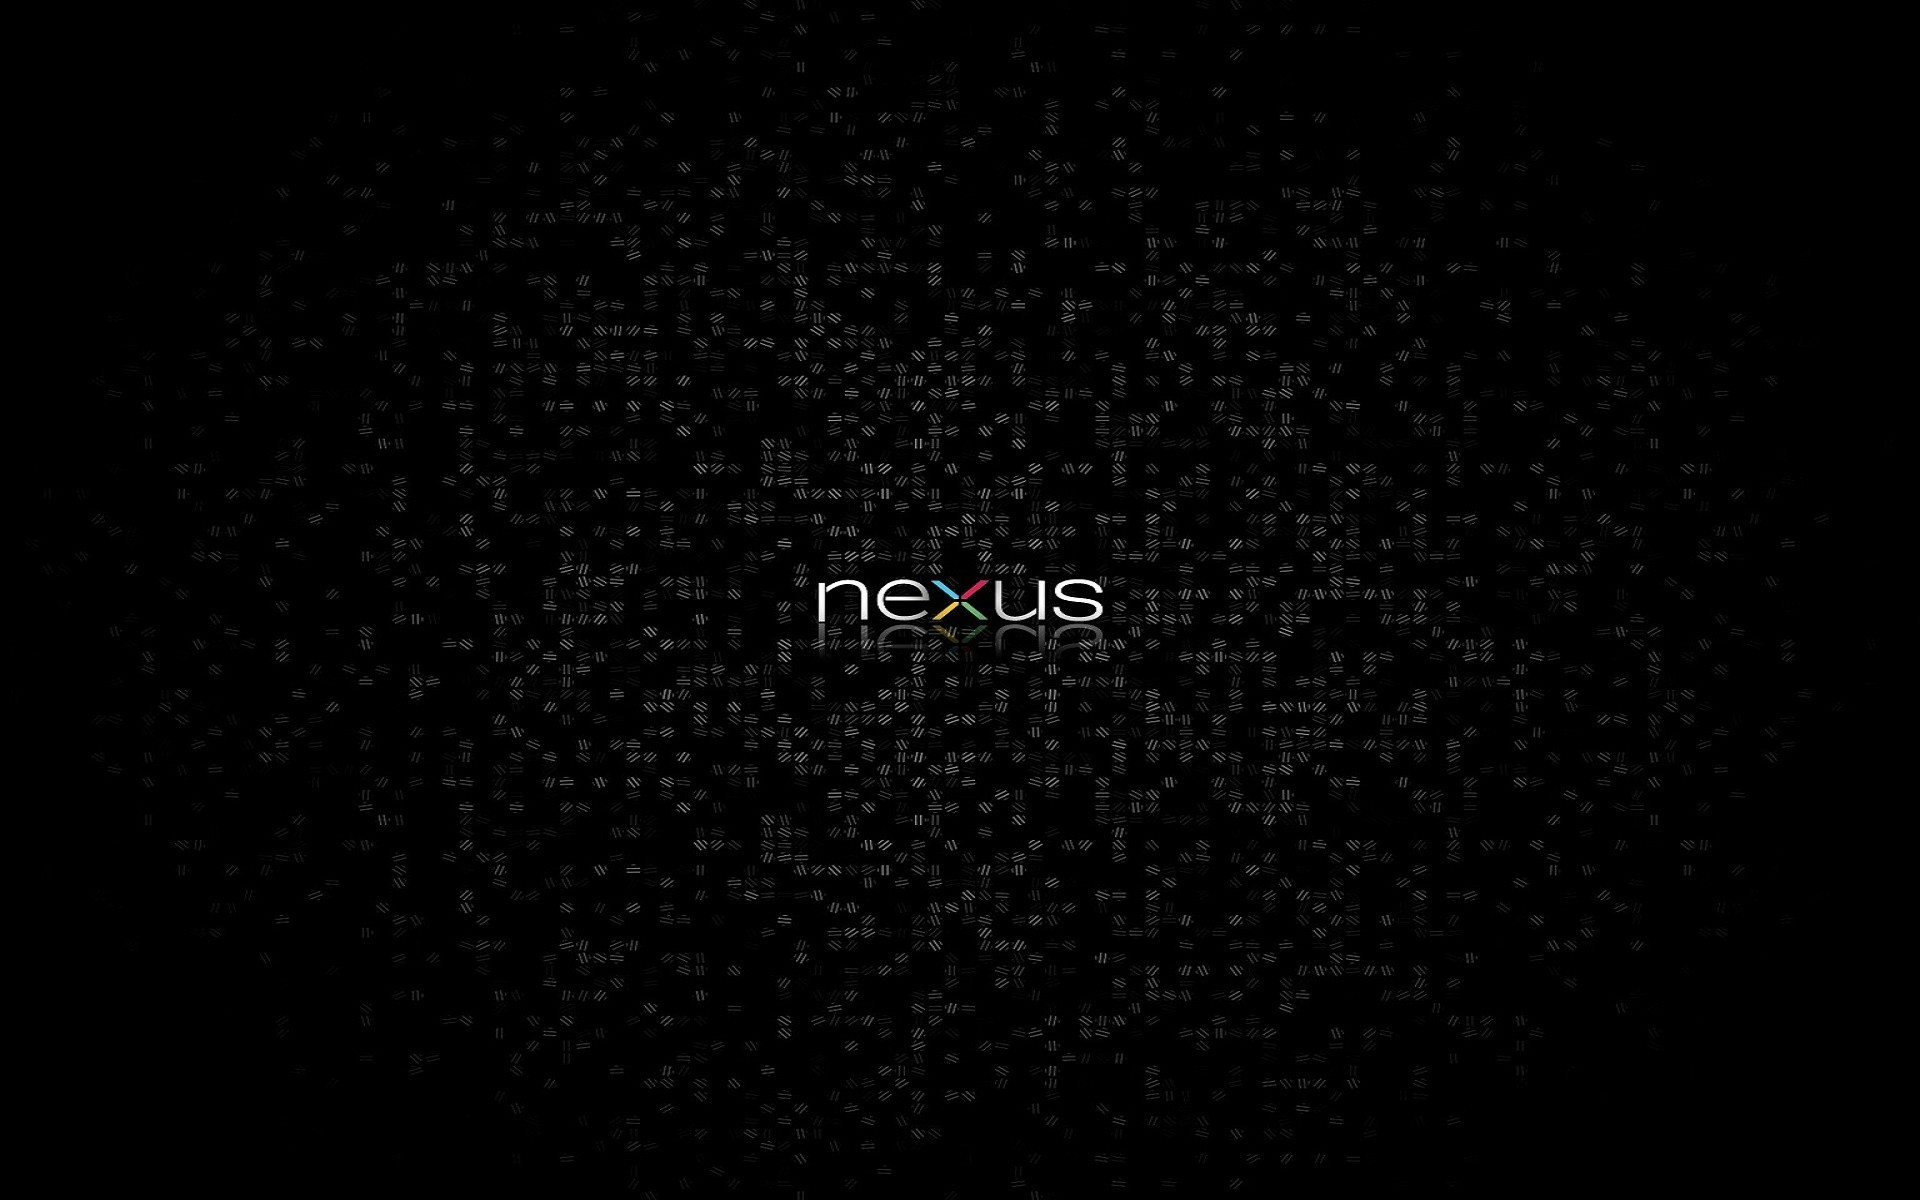 1920x1080 Wwe Night Of Champions 2012 Desktop Nexus Wallpaper By Greyson Jacobson 2017 03 26